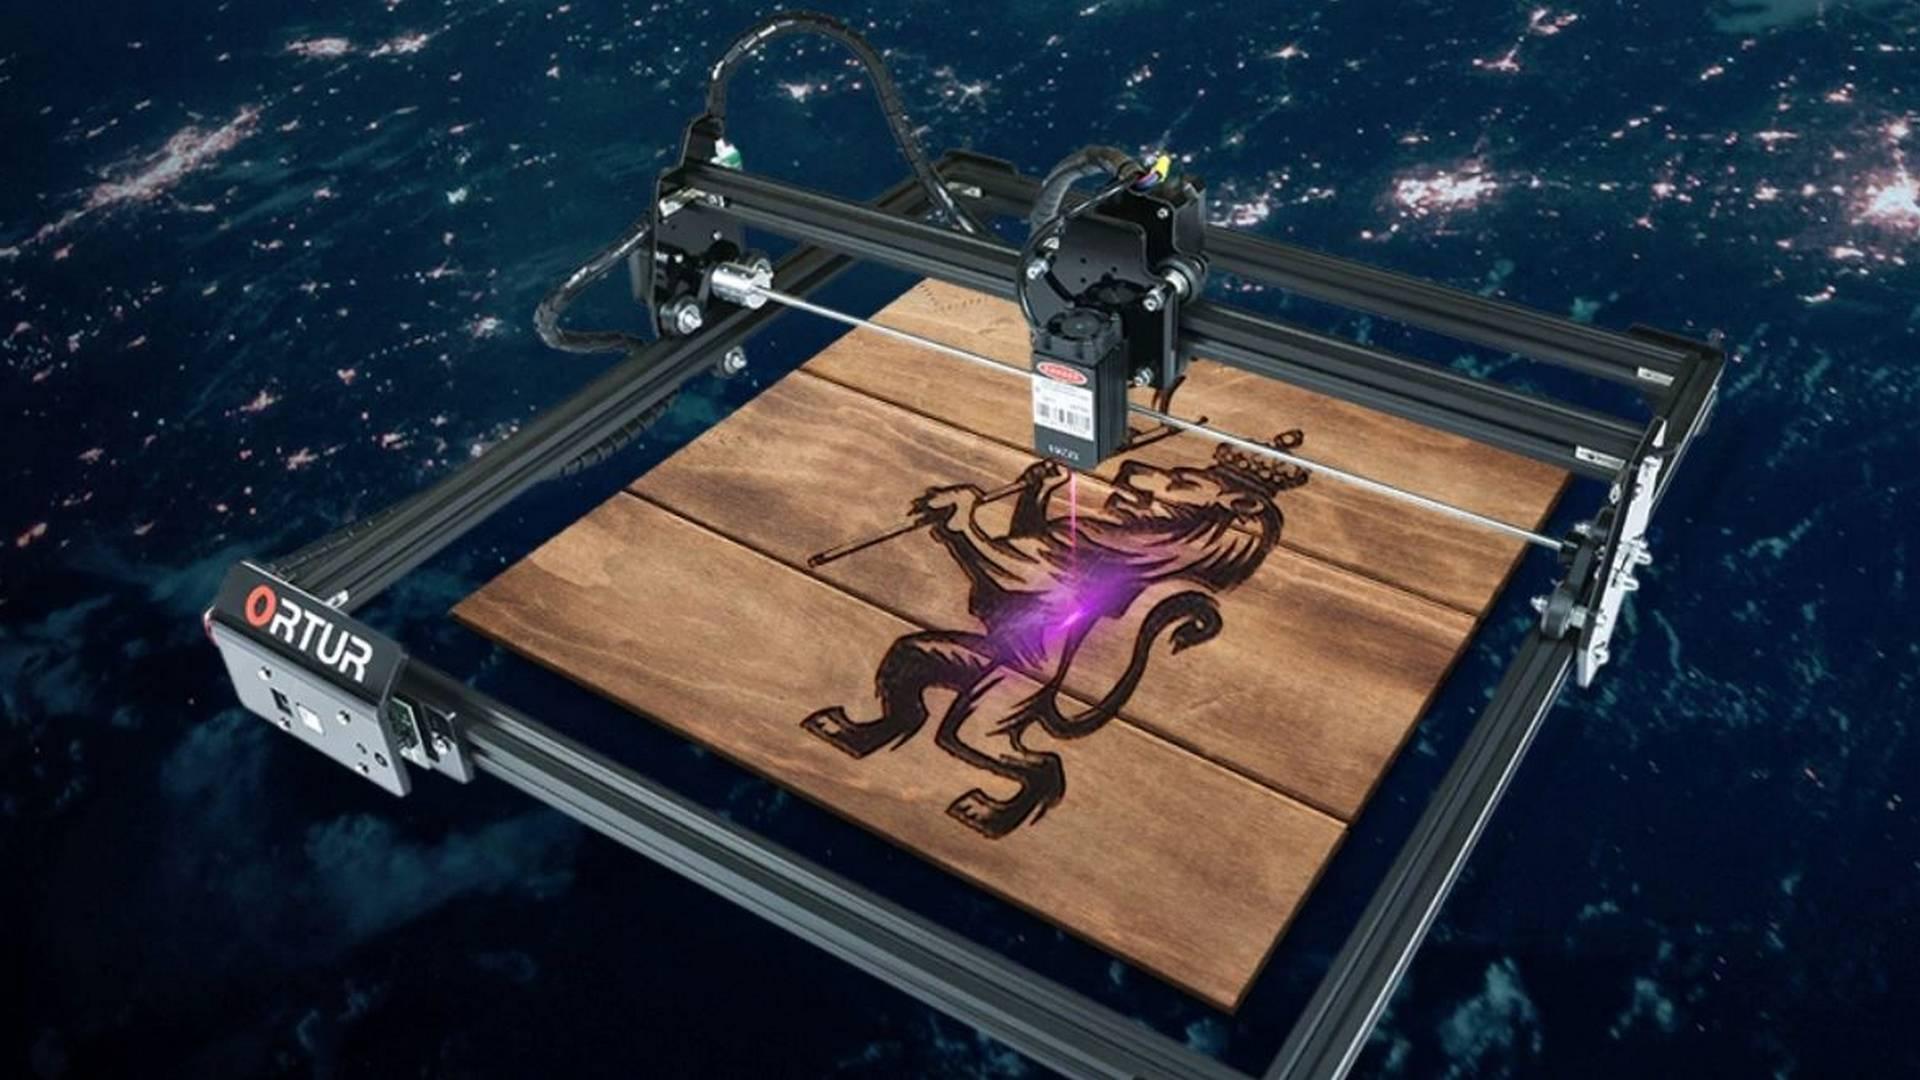 Incisore ORTUR Laser Master 2 – GearBest